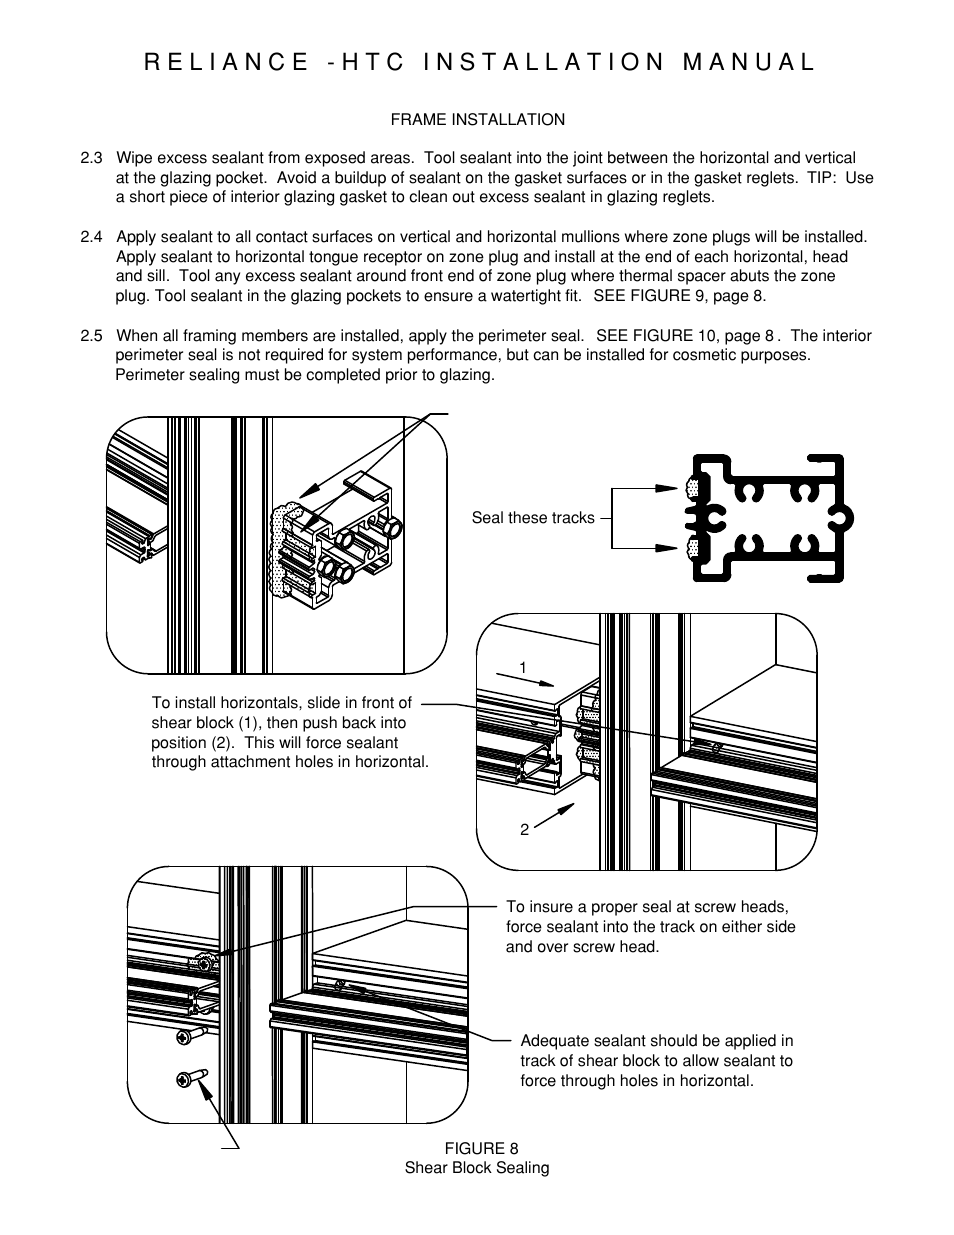 P12-shearblk-sealing | Oldcastle BuildingEnvelope Reliance